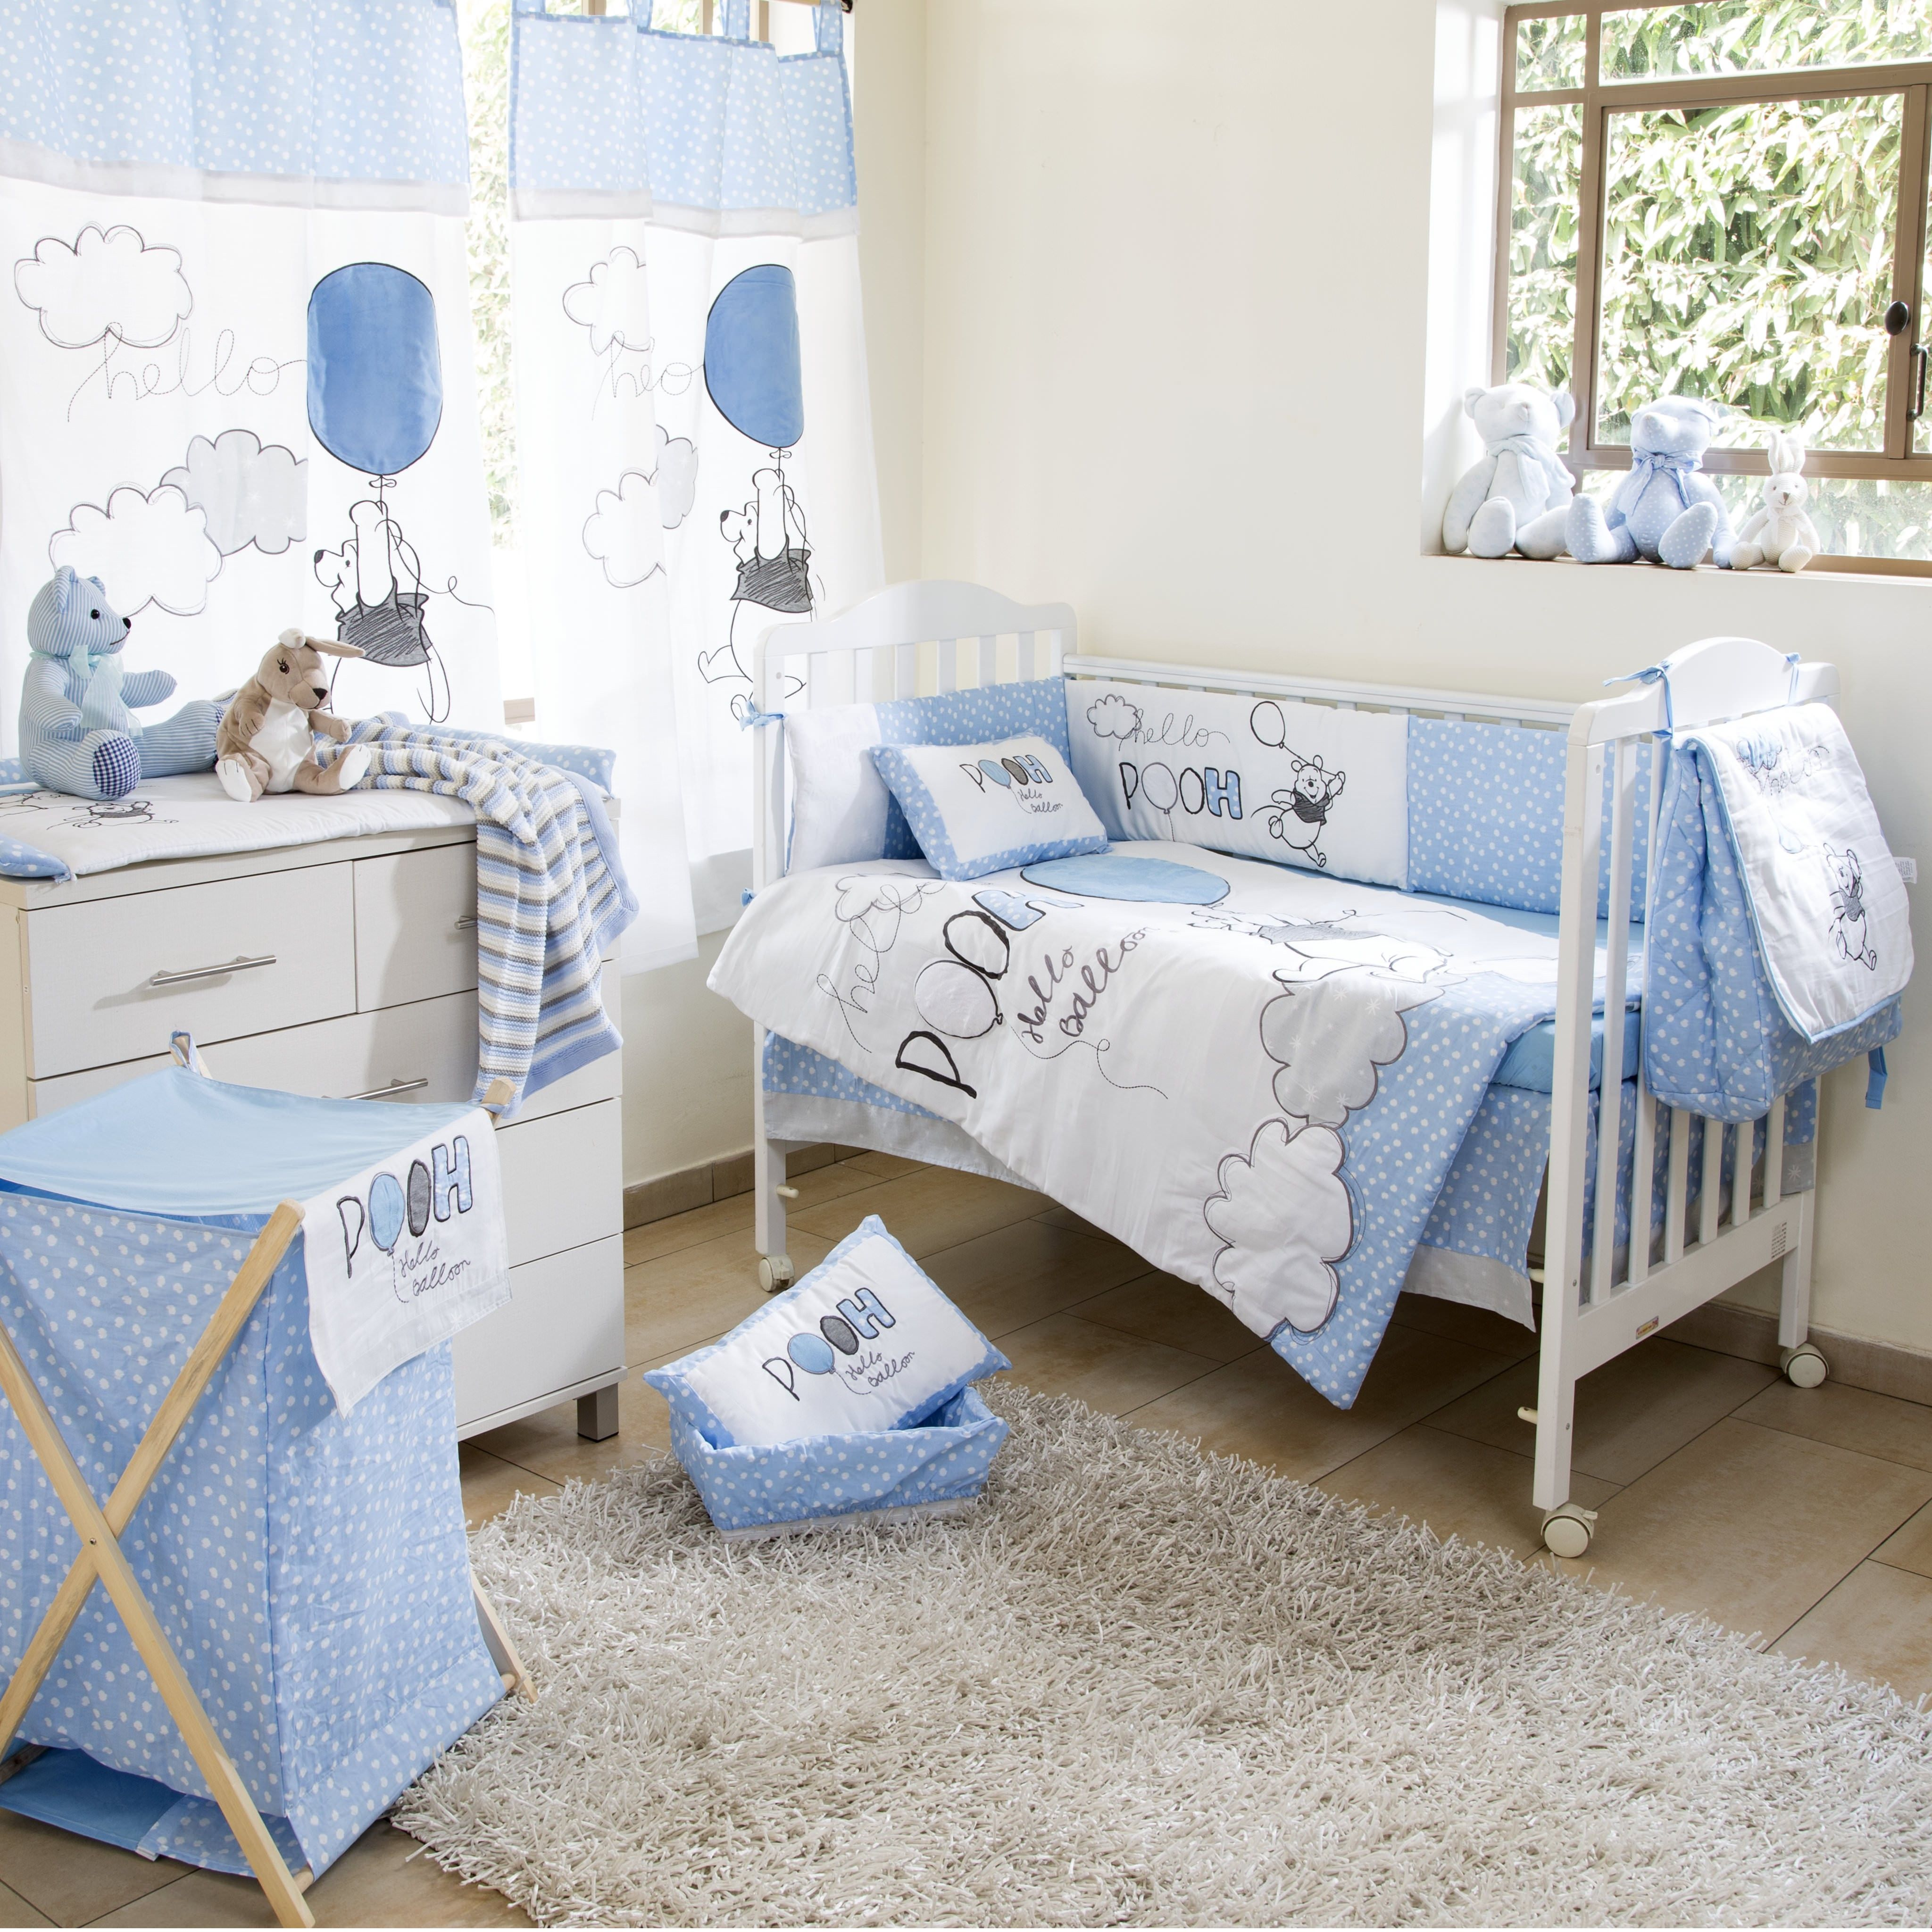 Disney Blue Winnie The Pooh Play Crib Bedding | Boys Crib ...